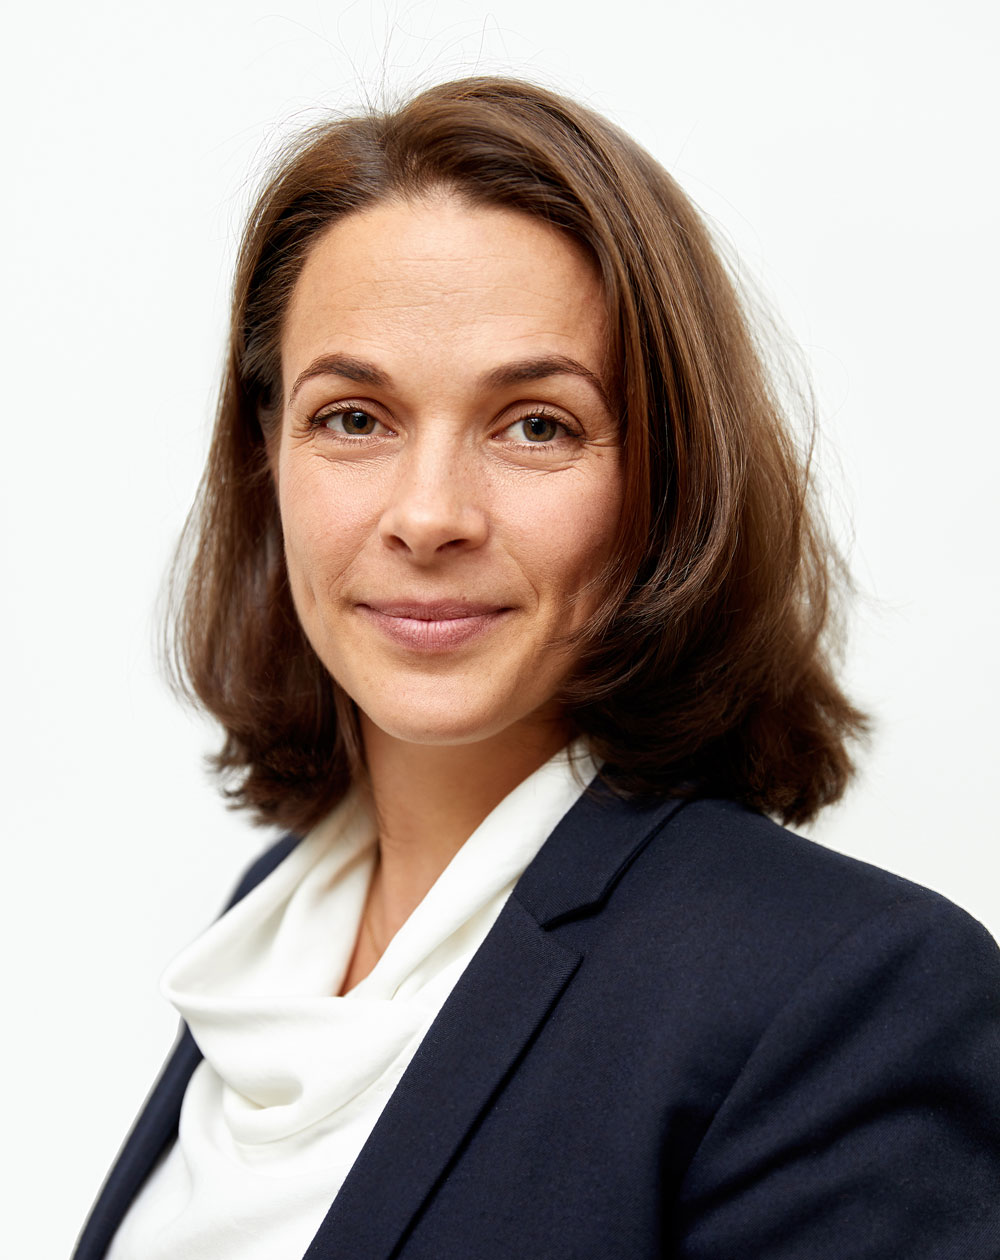 Portraitbild Linda Blumberg-Heise